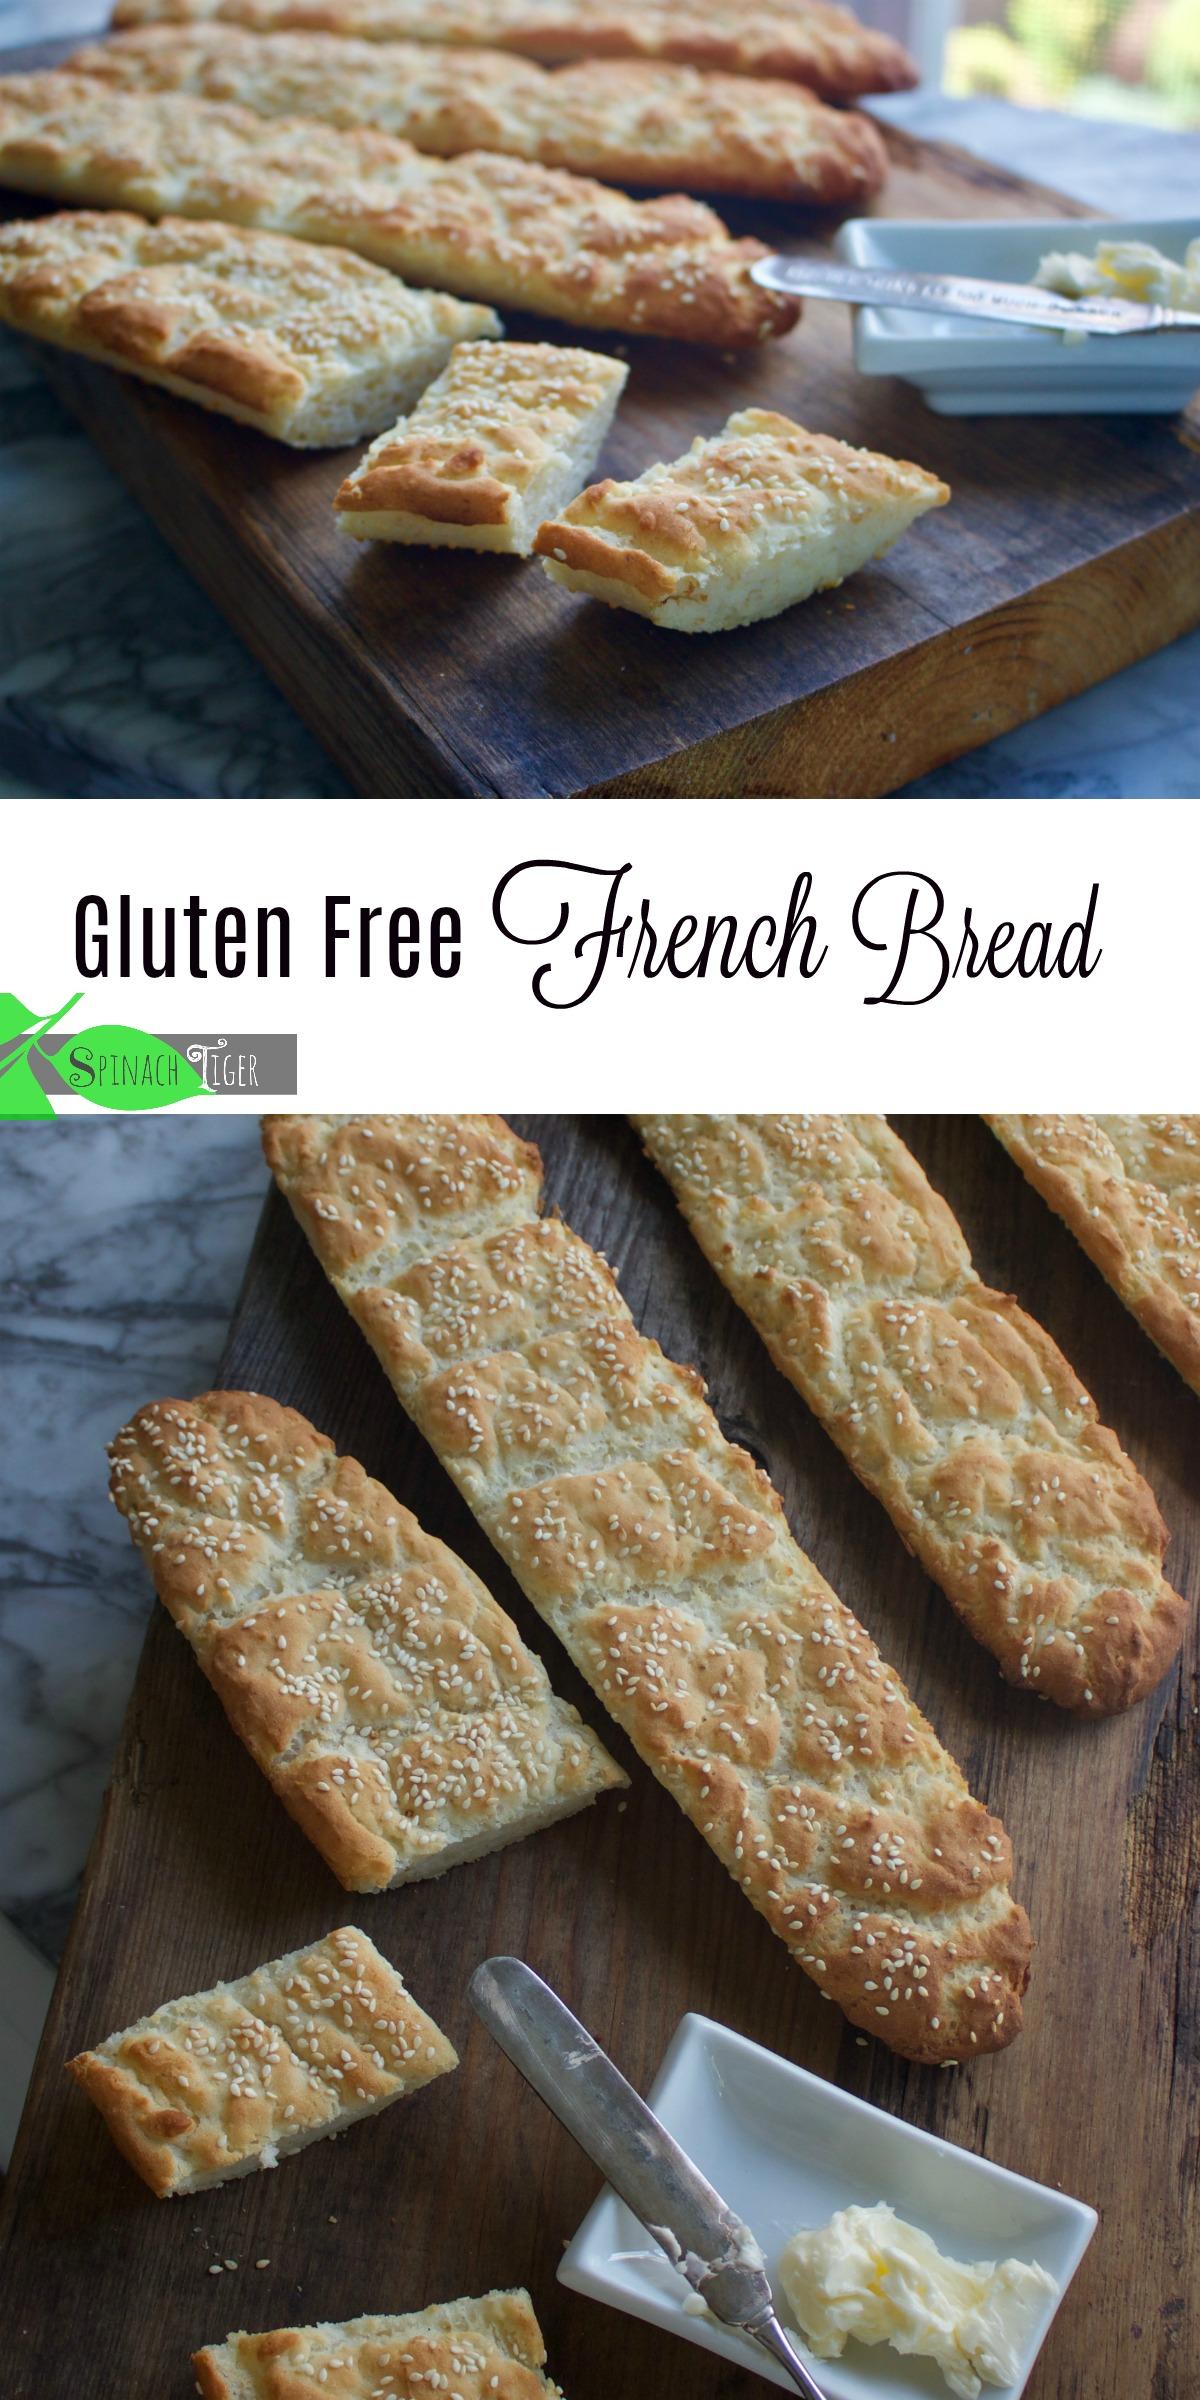 Delicious gluten free French Bread. Very easy to put together. #spinachtiger #glutenfreebread #glutenfreefrenchbread via @angelaroberts